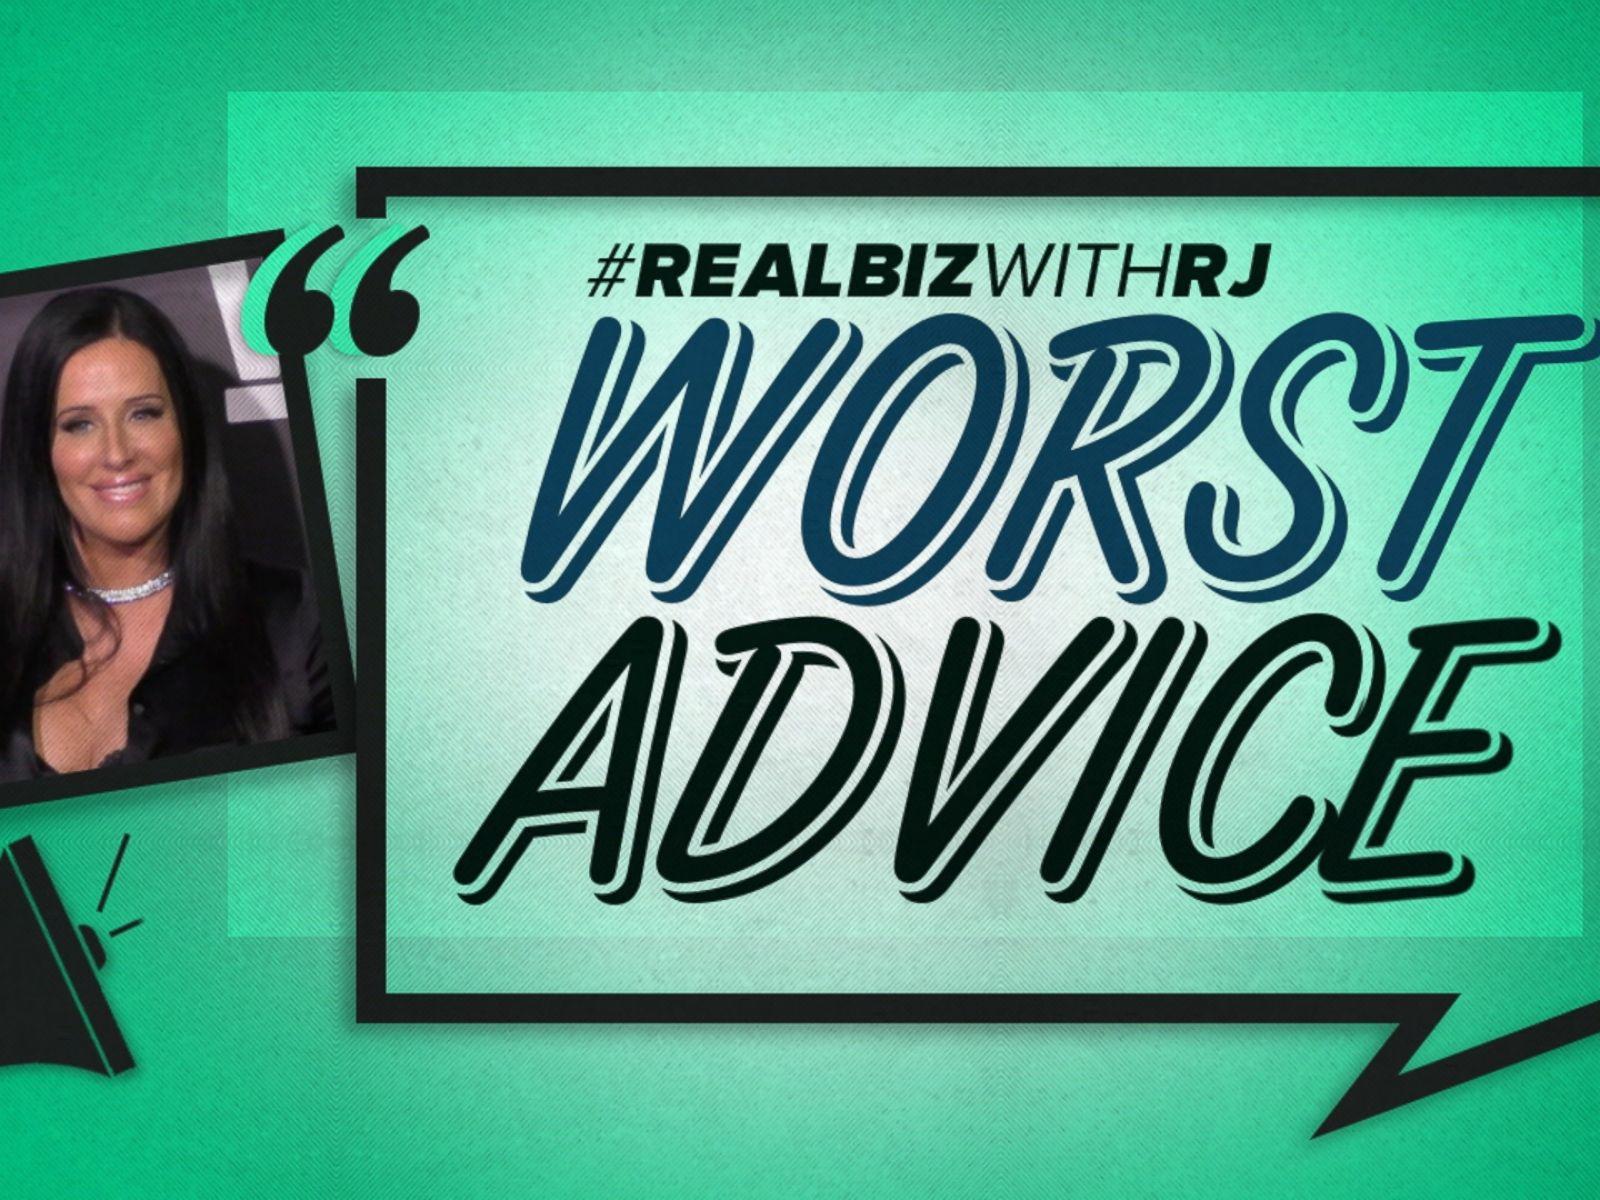 Worst Advice: Patti Stanger